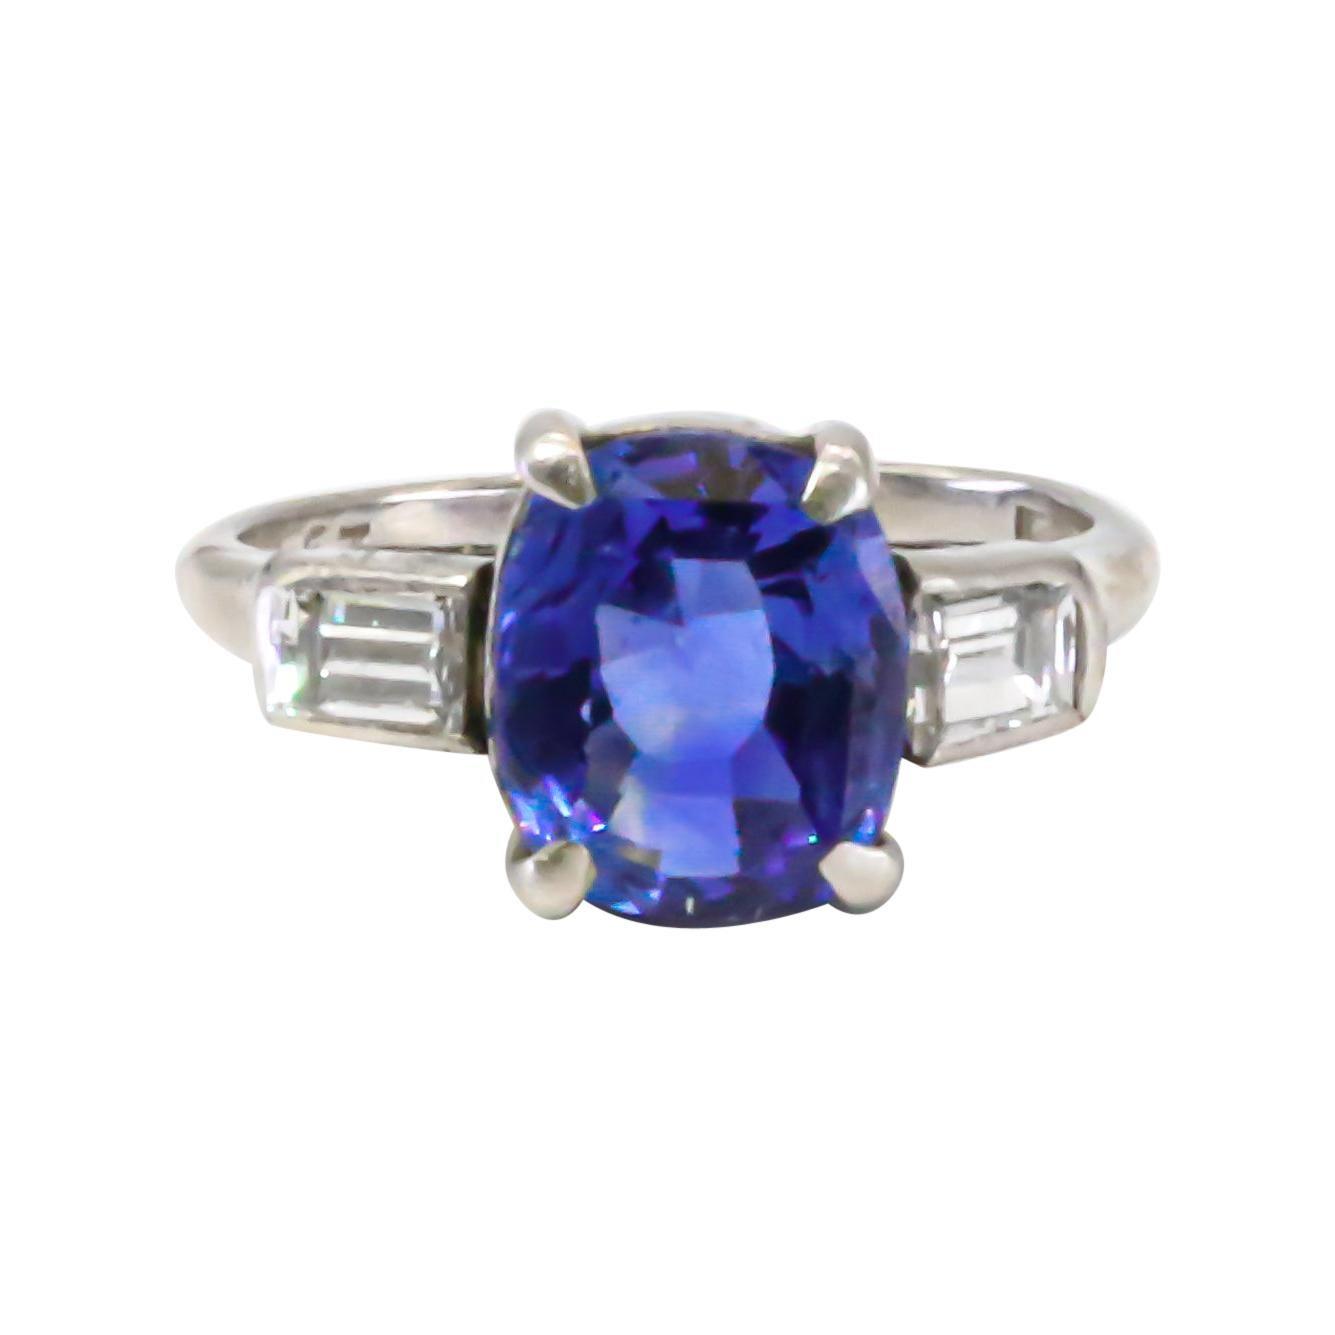 GIA Certified No Heat Sapphire Ring